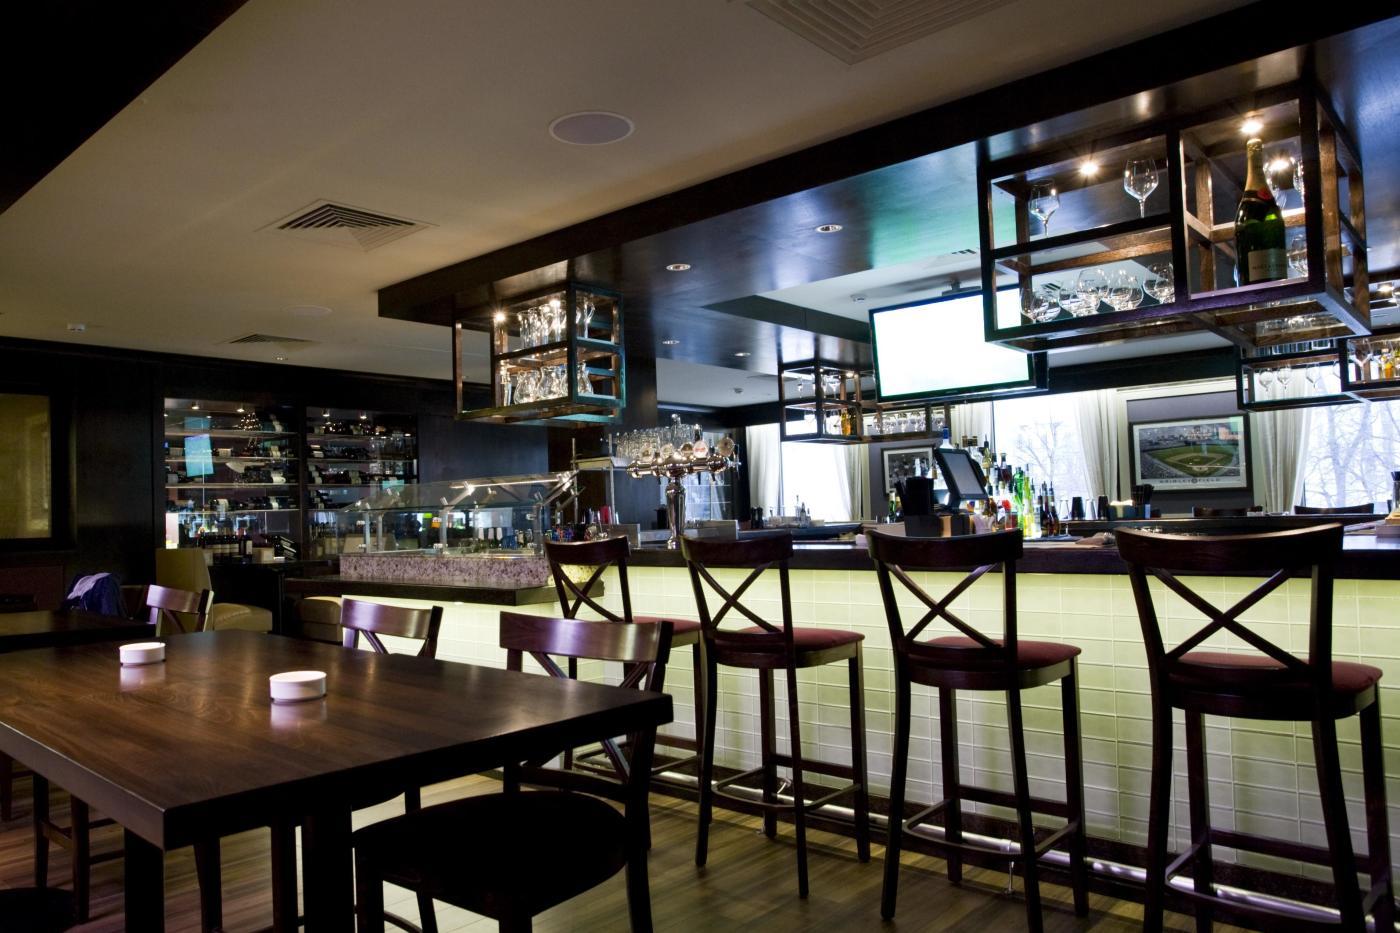 Стейк-хаус Чикаго Прайм на Страстном бульваре (Chicago Prime Steakhouse & Bar) фото 11